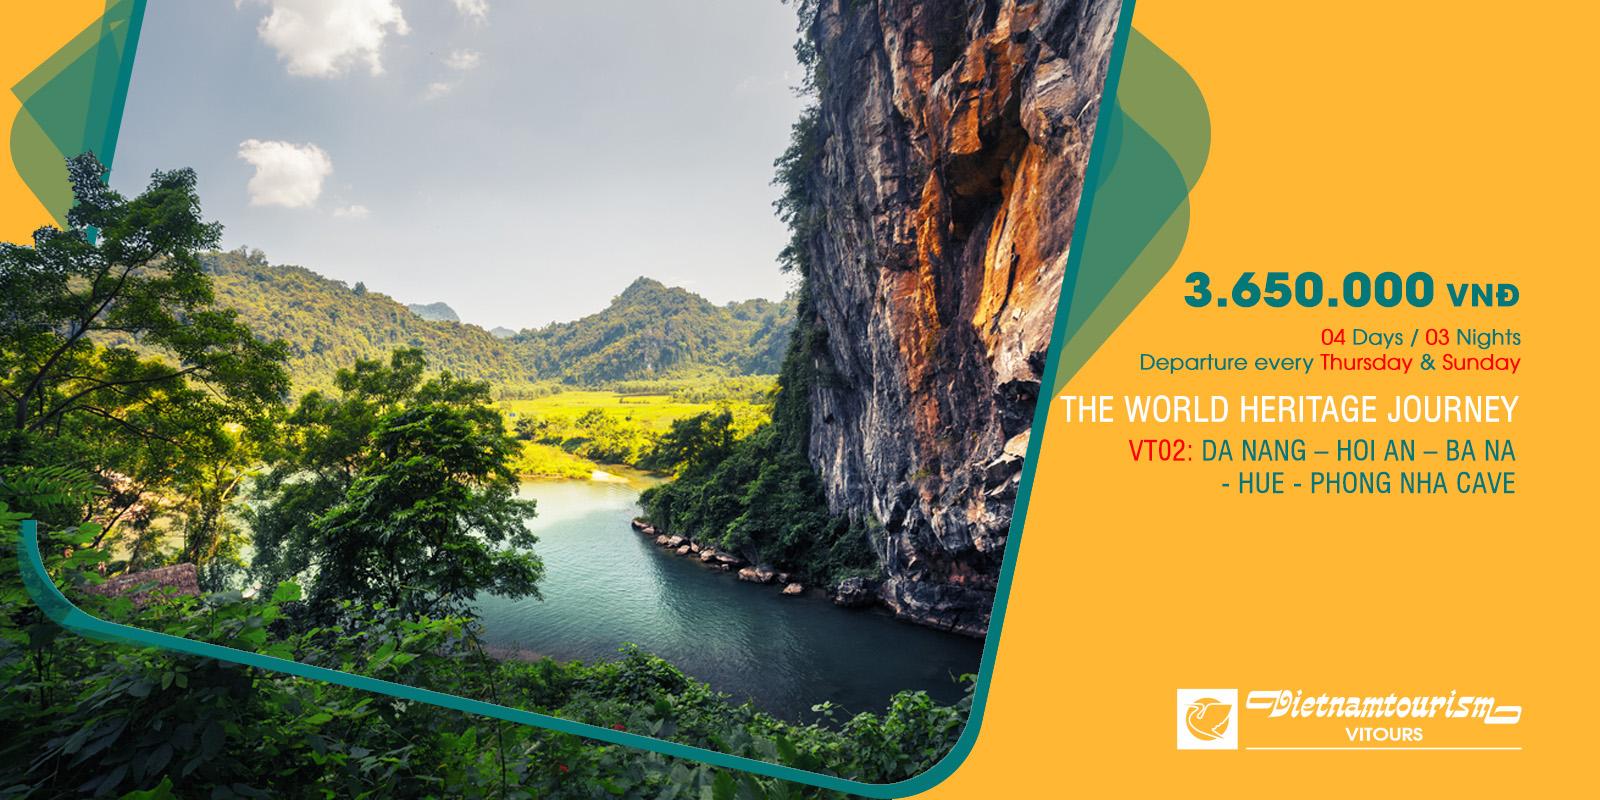 Tour the world heritage journey 4D3N 3.650.000 vnd Vitours JSC